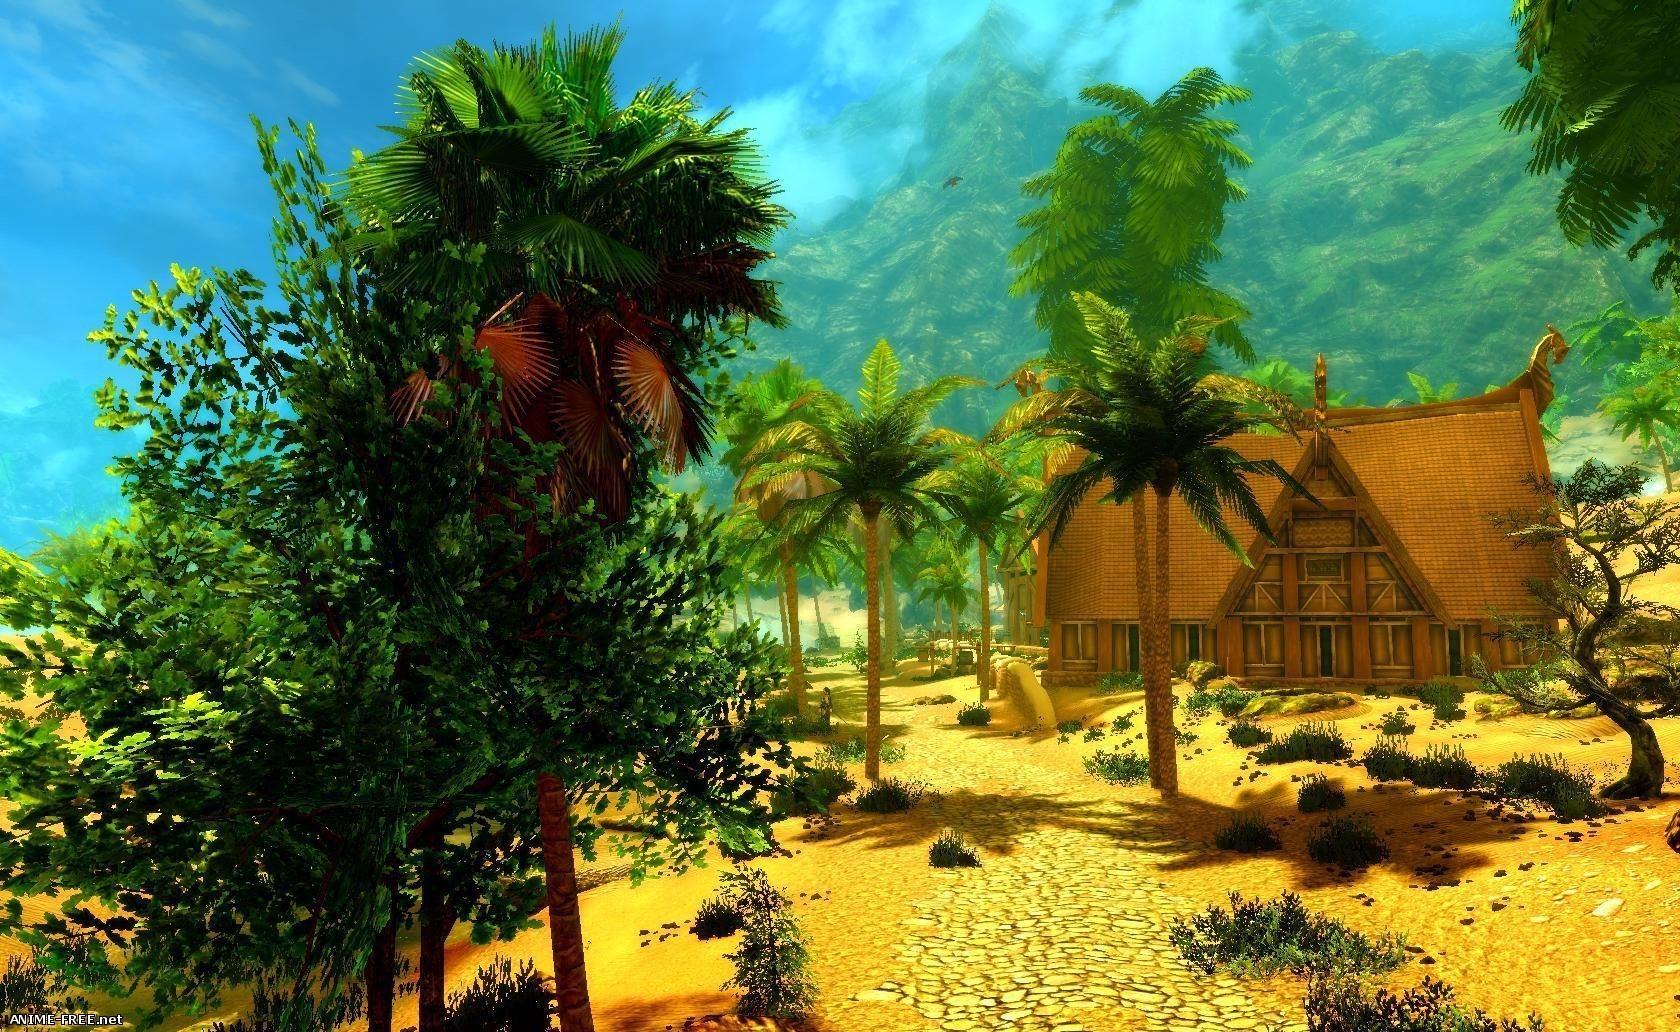 Tropical Sexrim SSE / Тропический Сексрим (Cборка Модов) [2018] [Uncen] [RPG, 3D] [RUS] H-Game